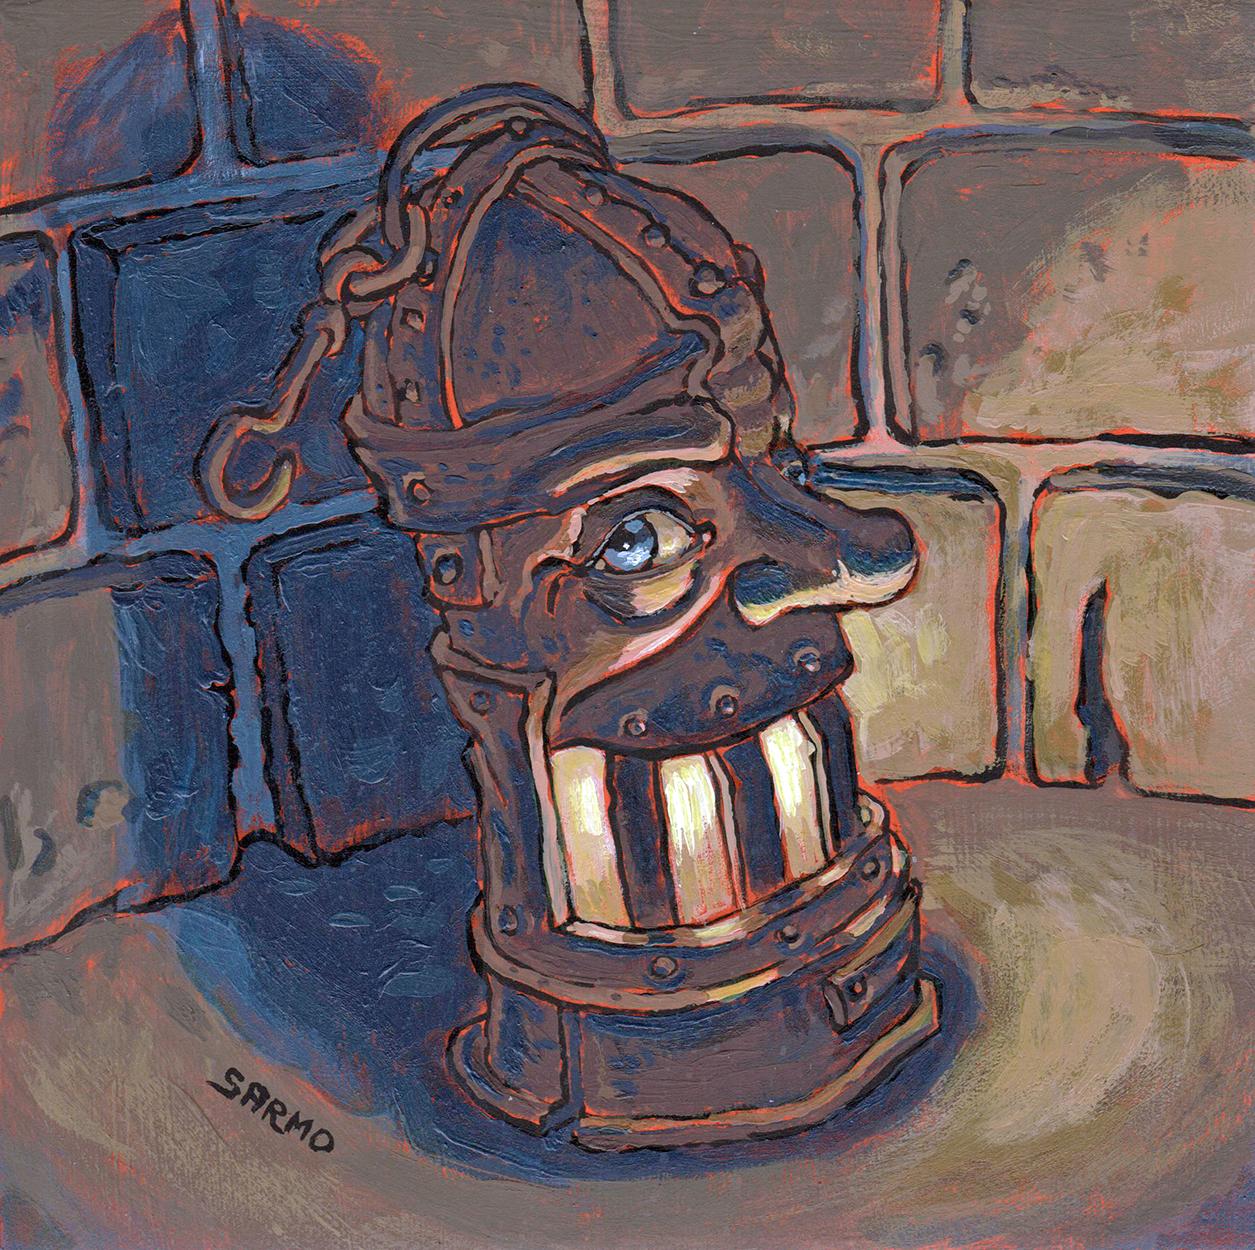 Magic Lantern Artwork by Tom Sarmo